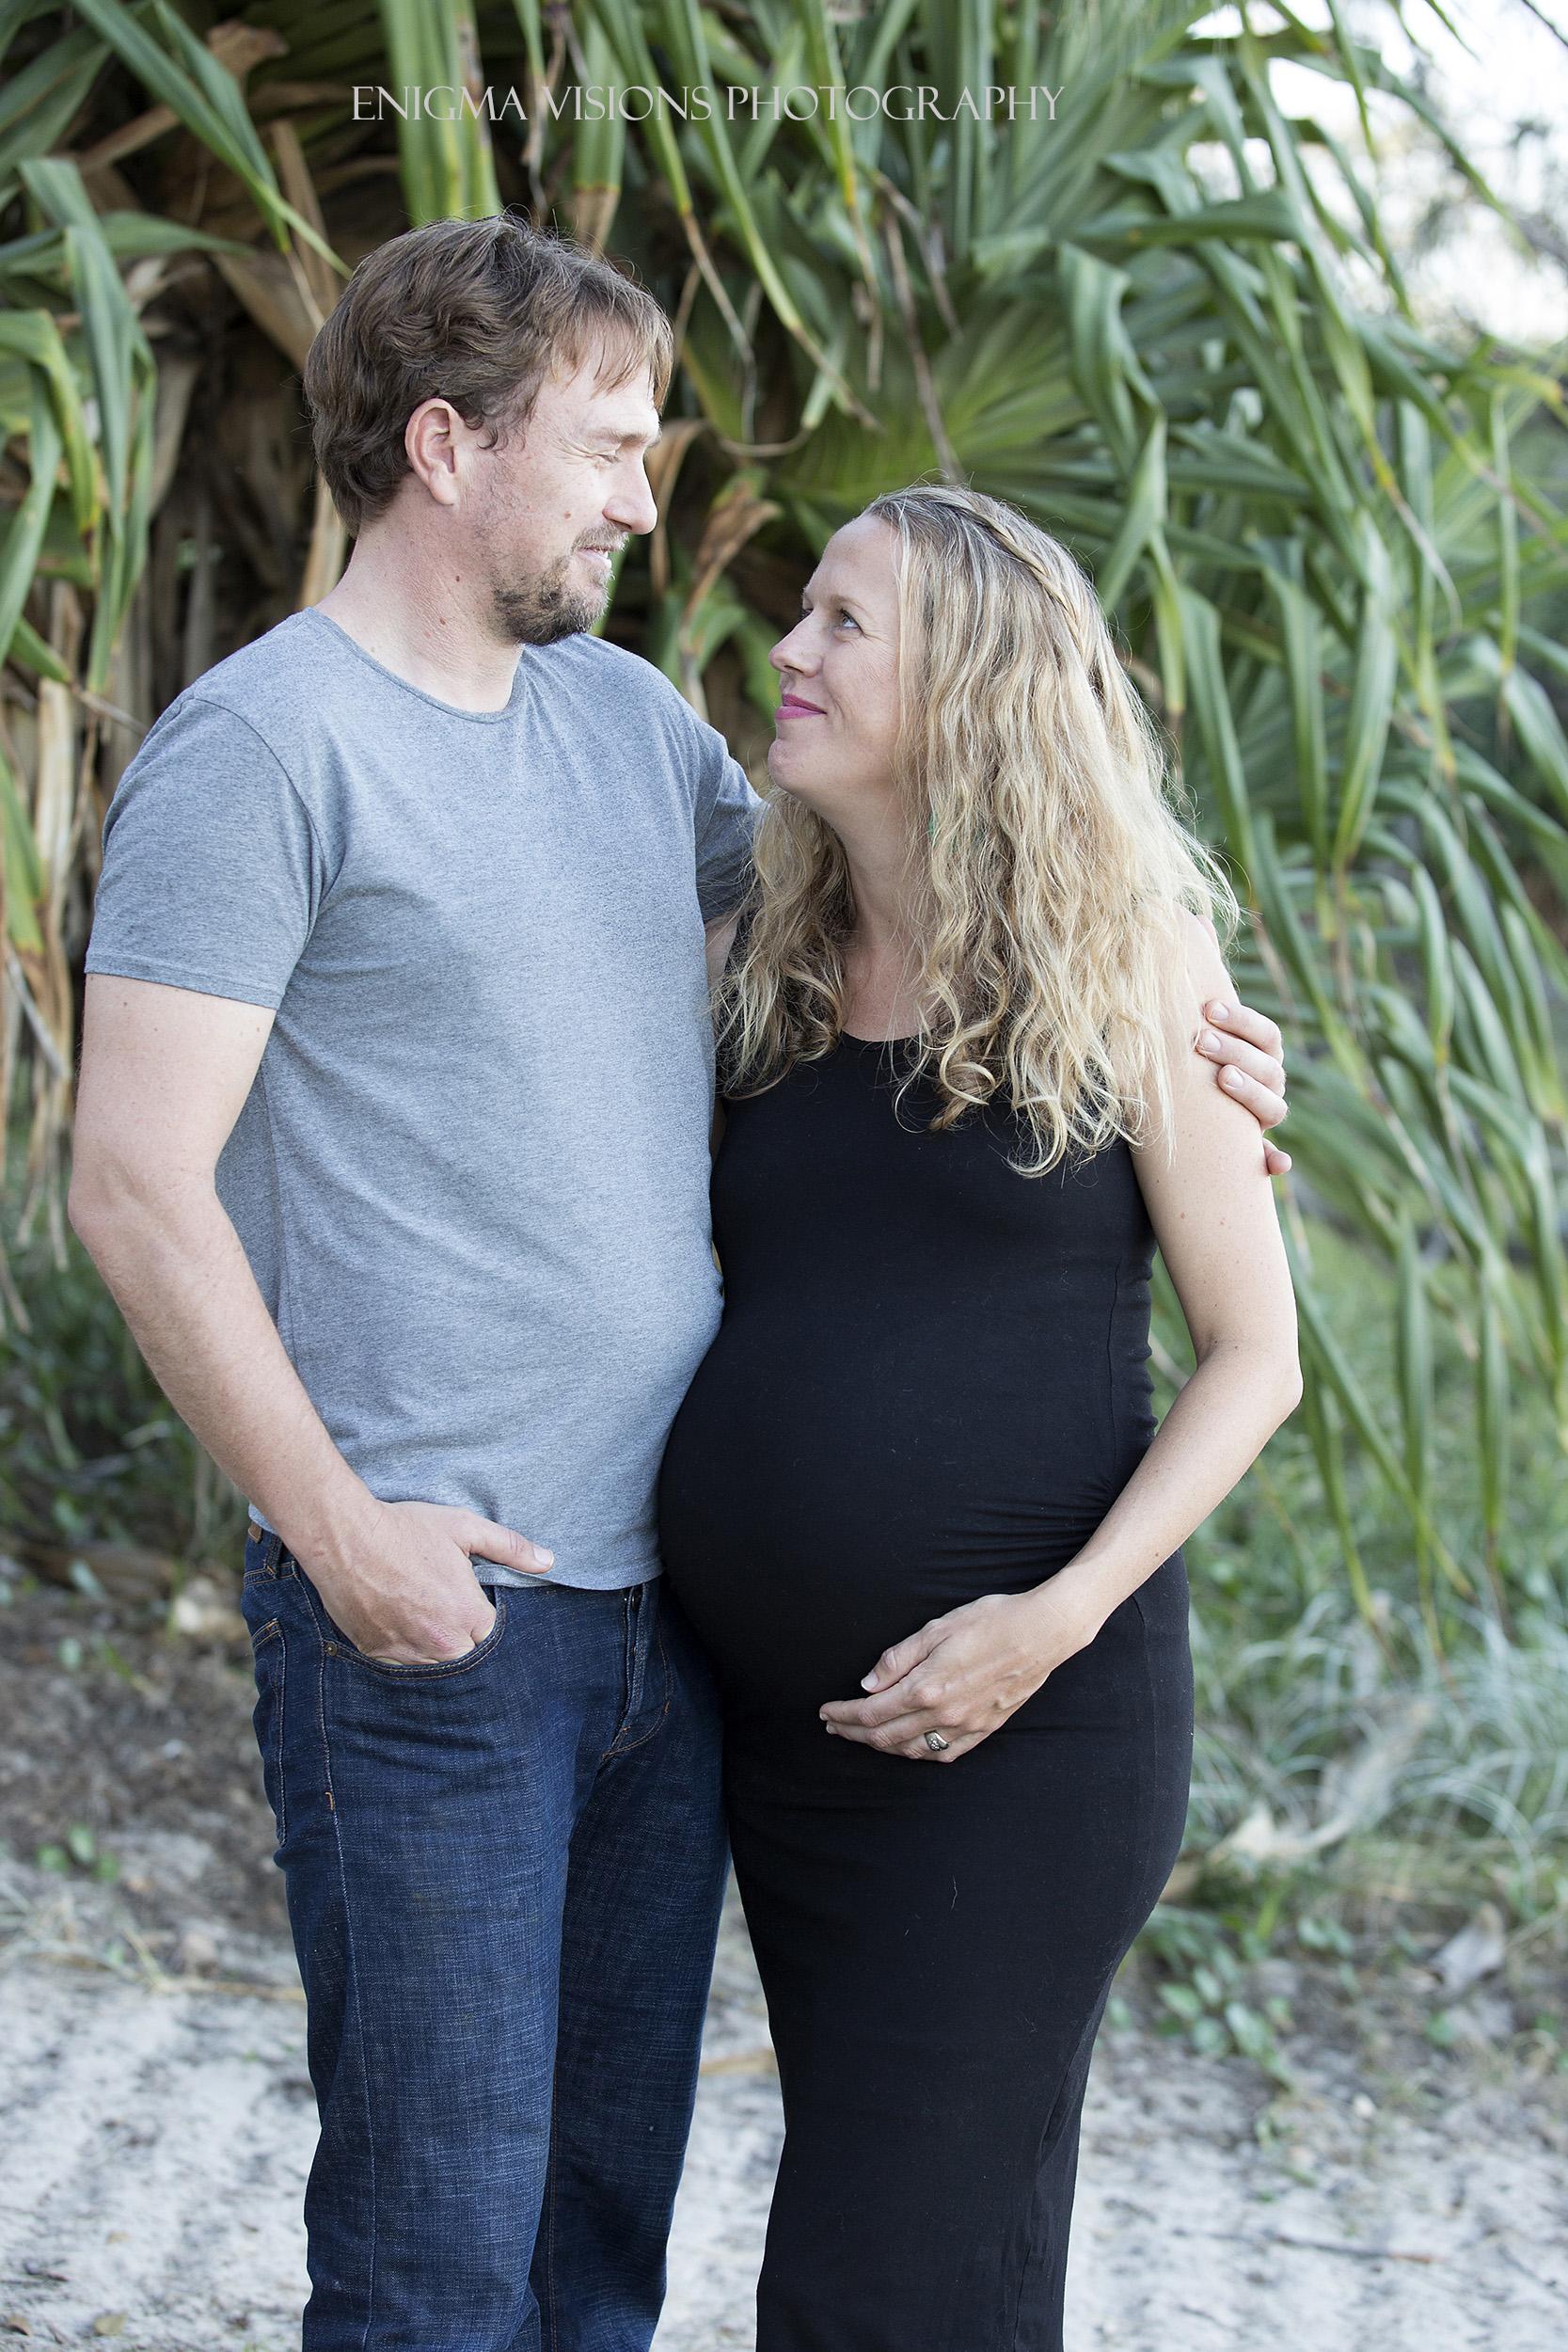 enigma_visions_photography_maternity_melandandrew_kingscliff (16).jpg